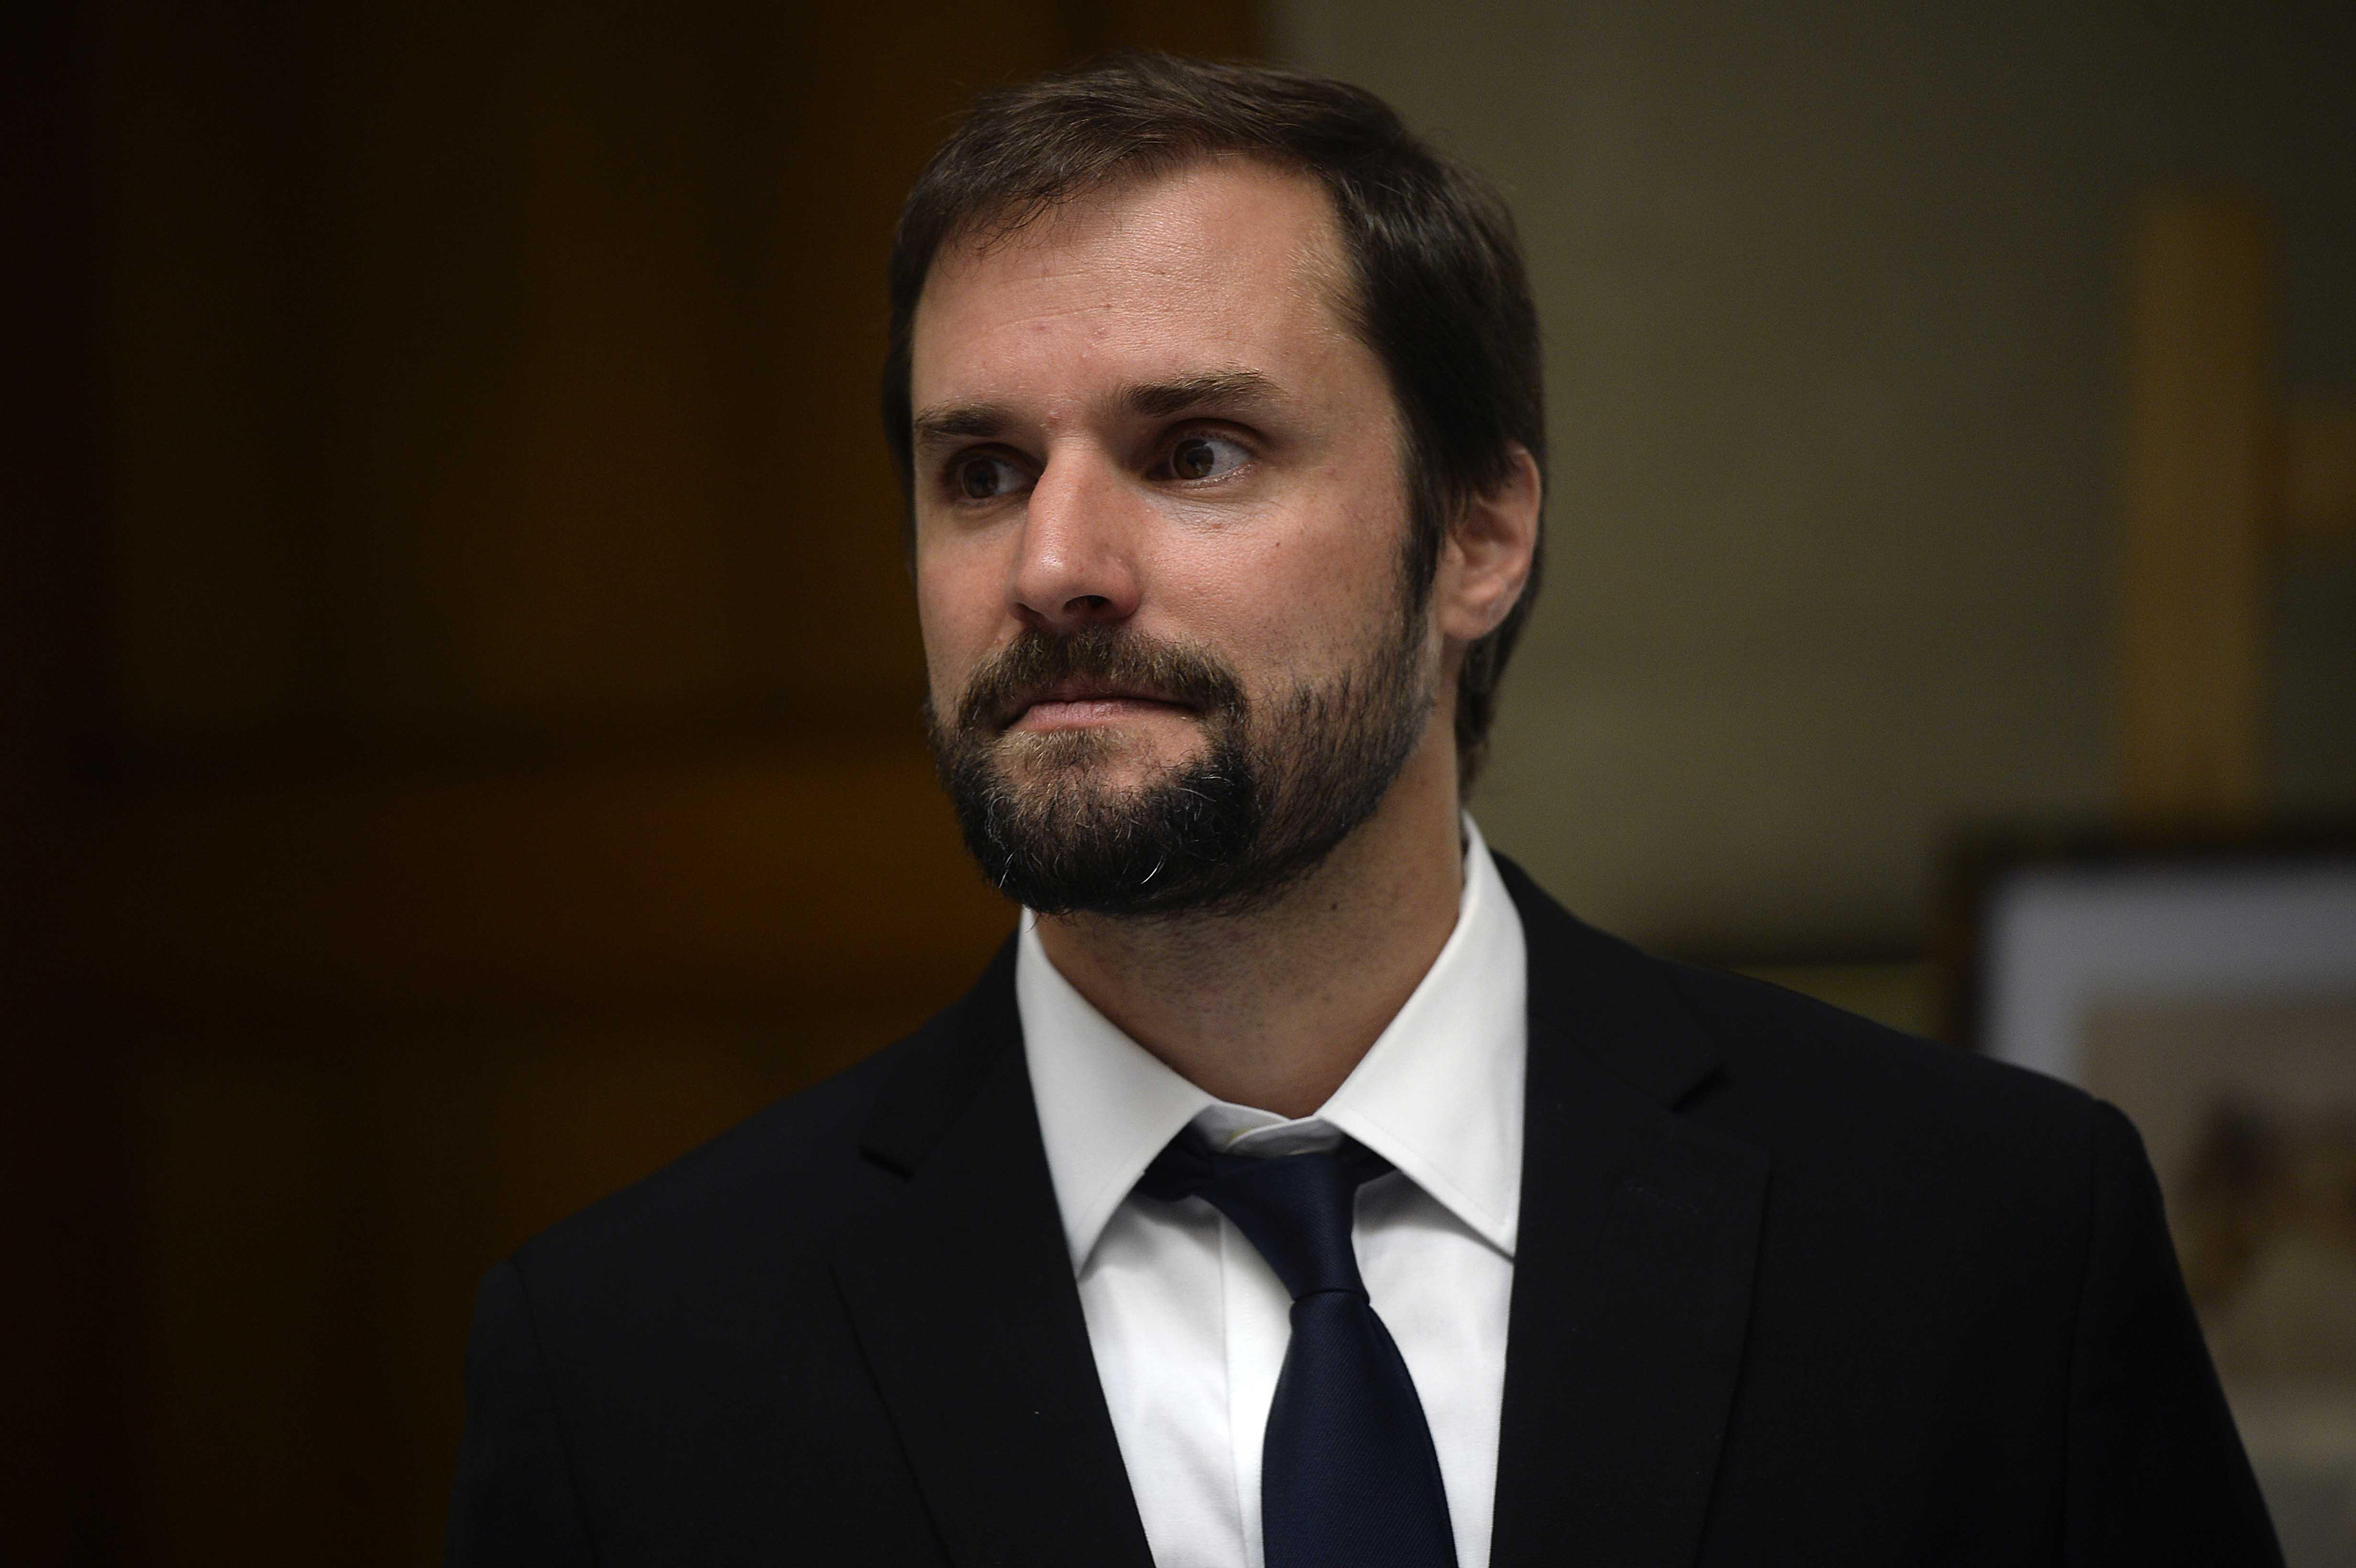 Bellolio vuelve a la carga contra directiva de la UDI